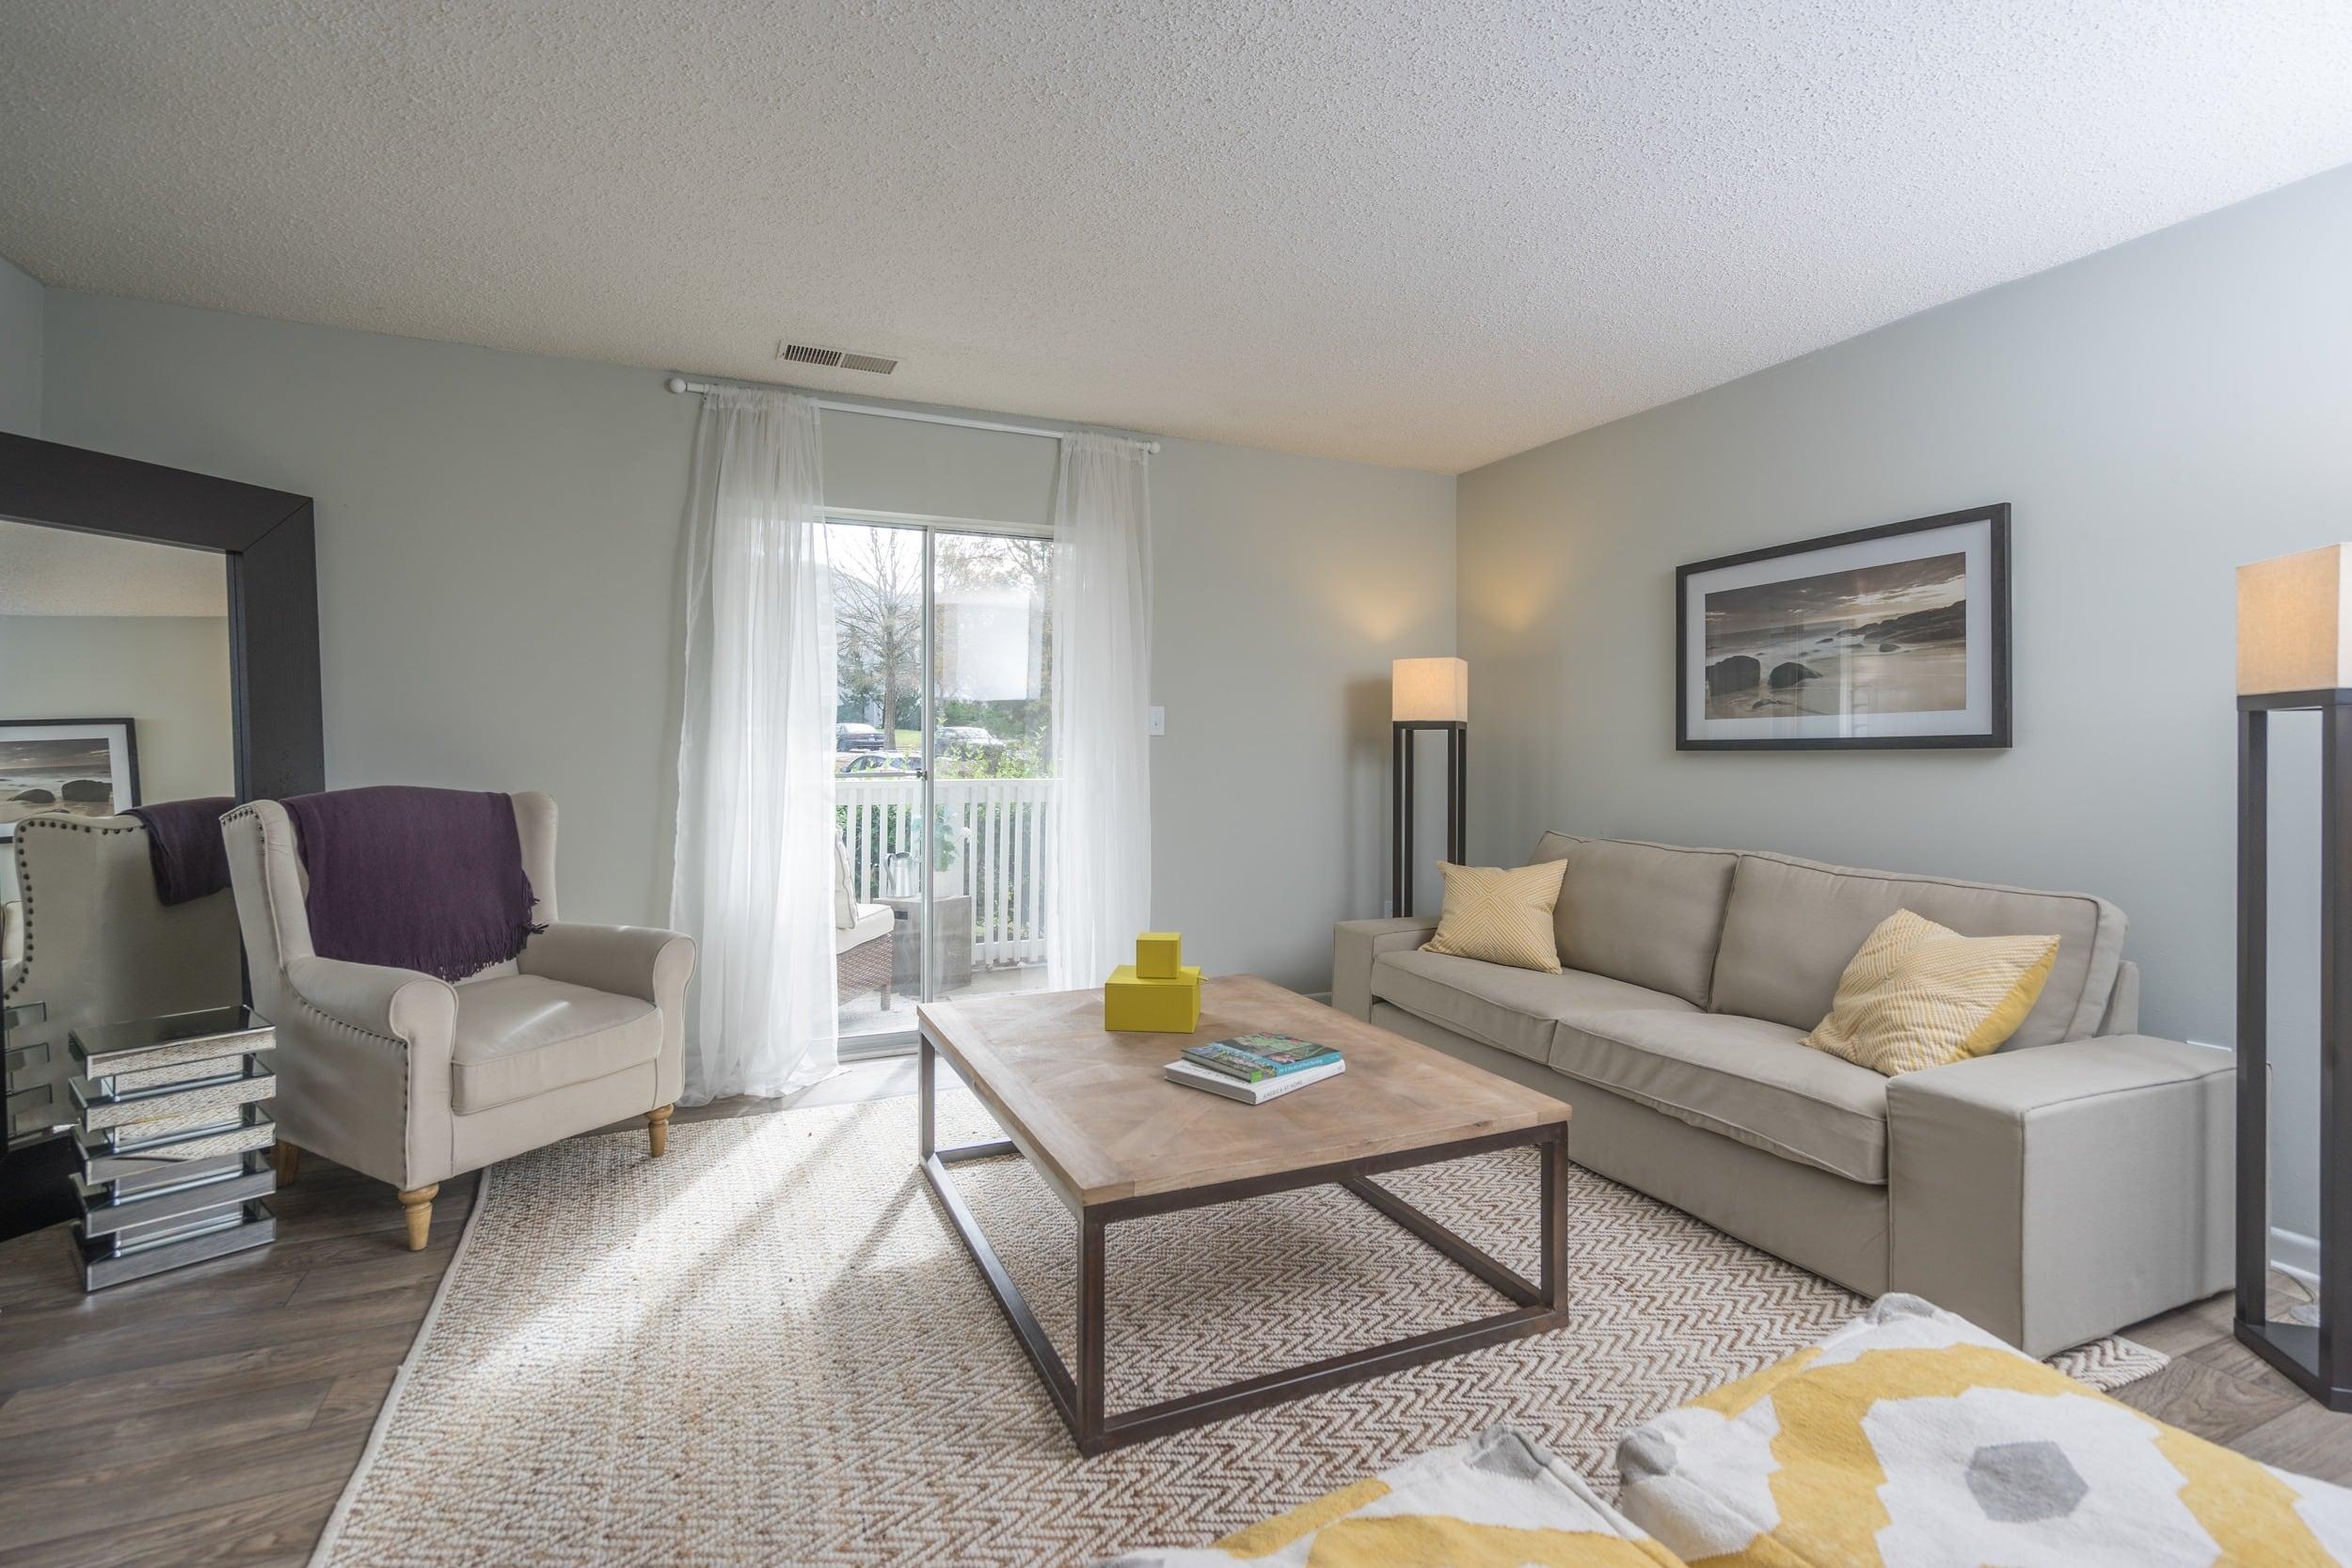 Apartments at Paces River Apartments in Rock Hill, South Carolina